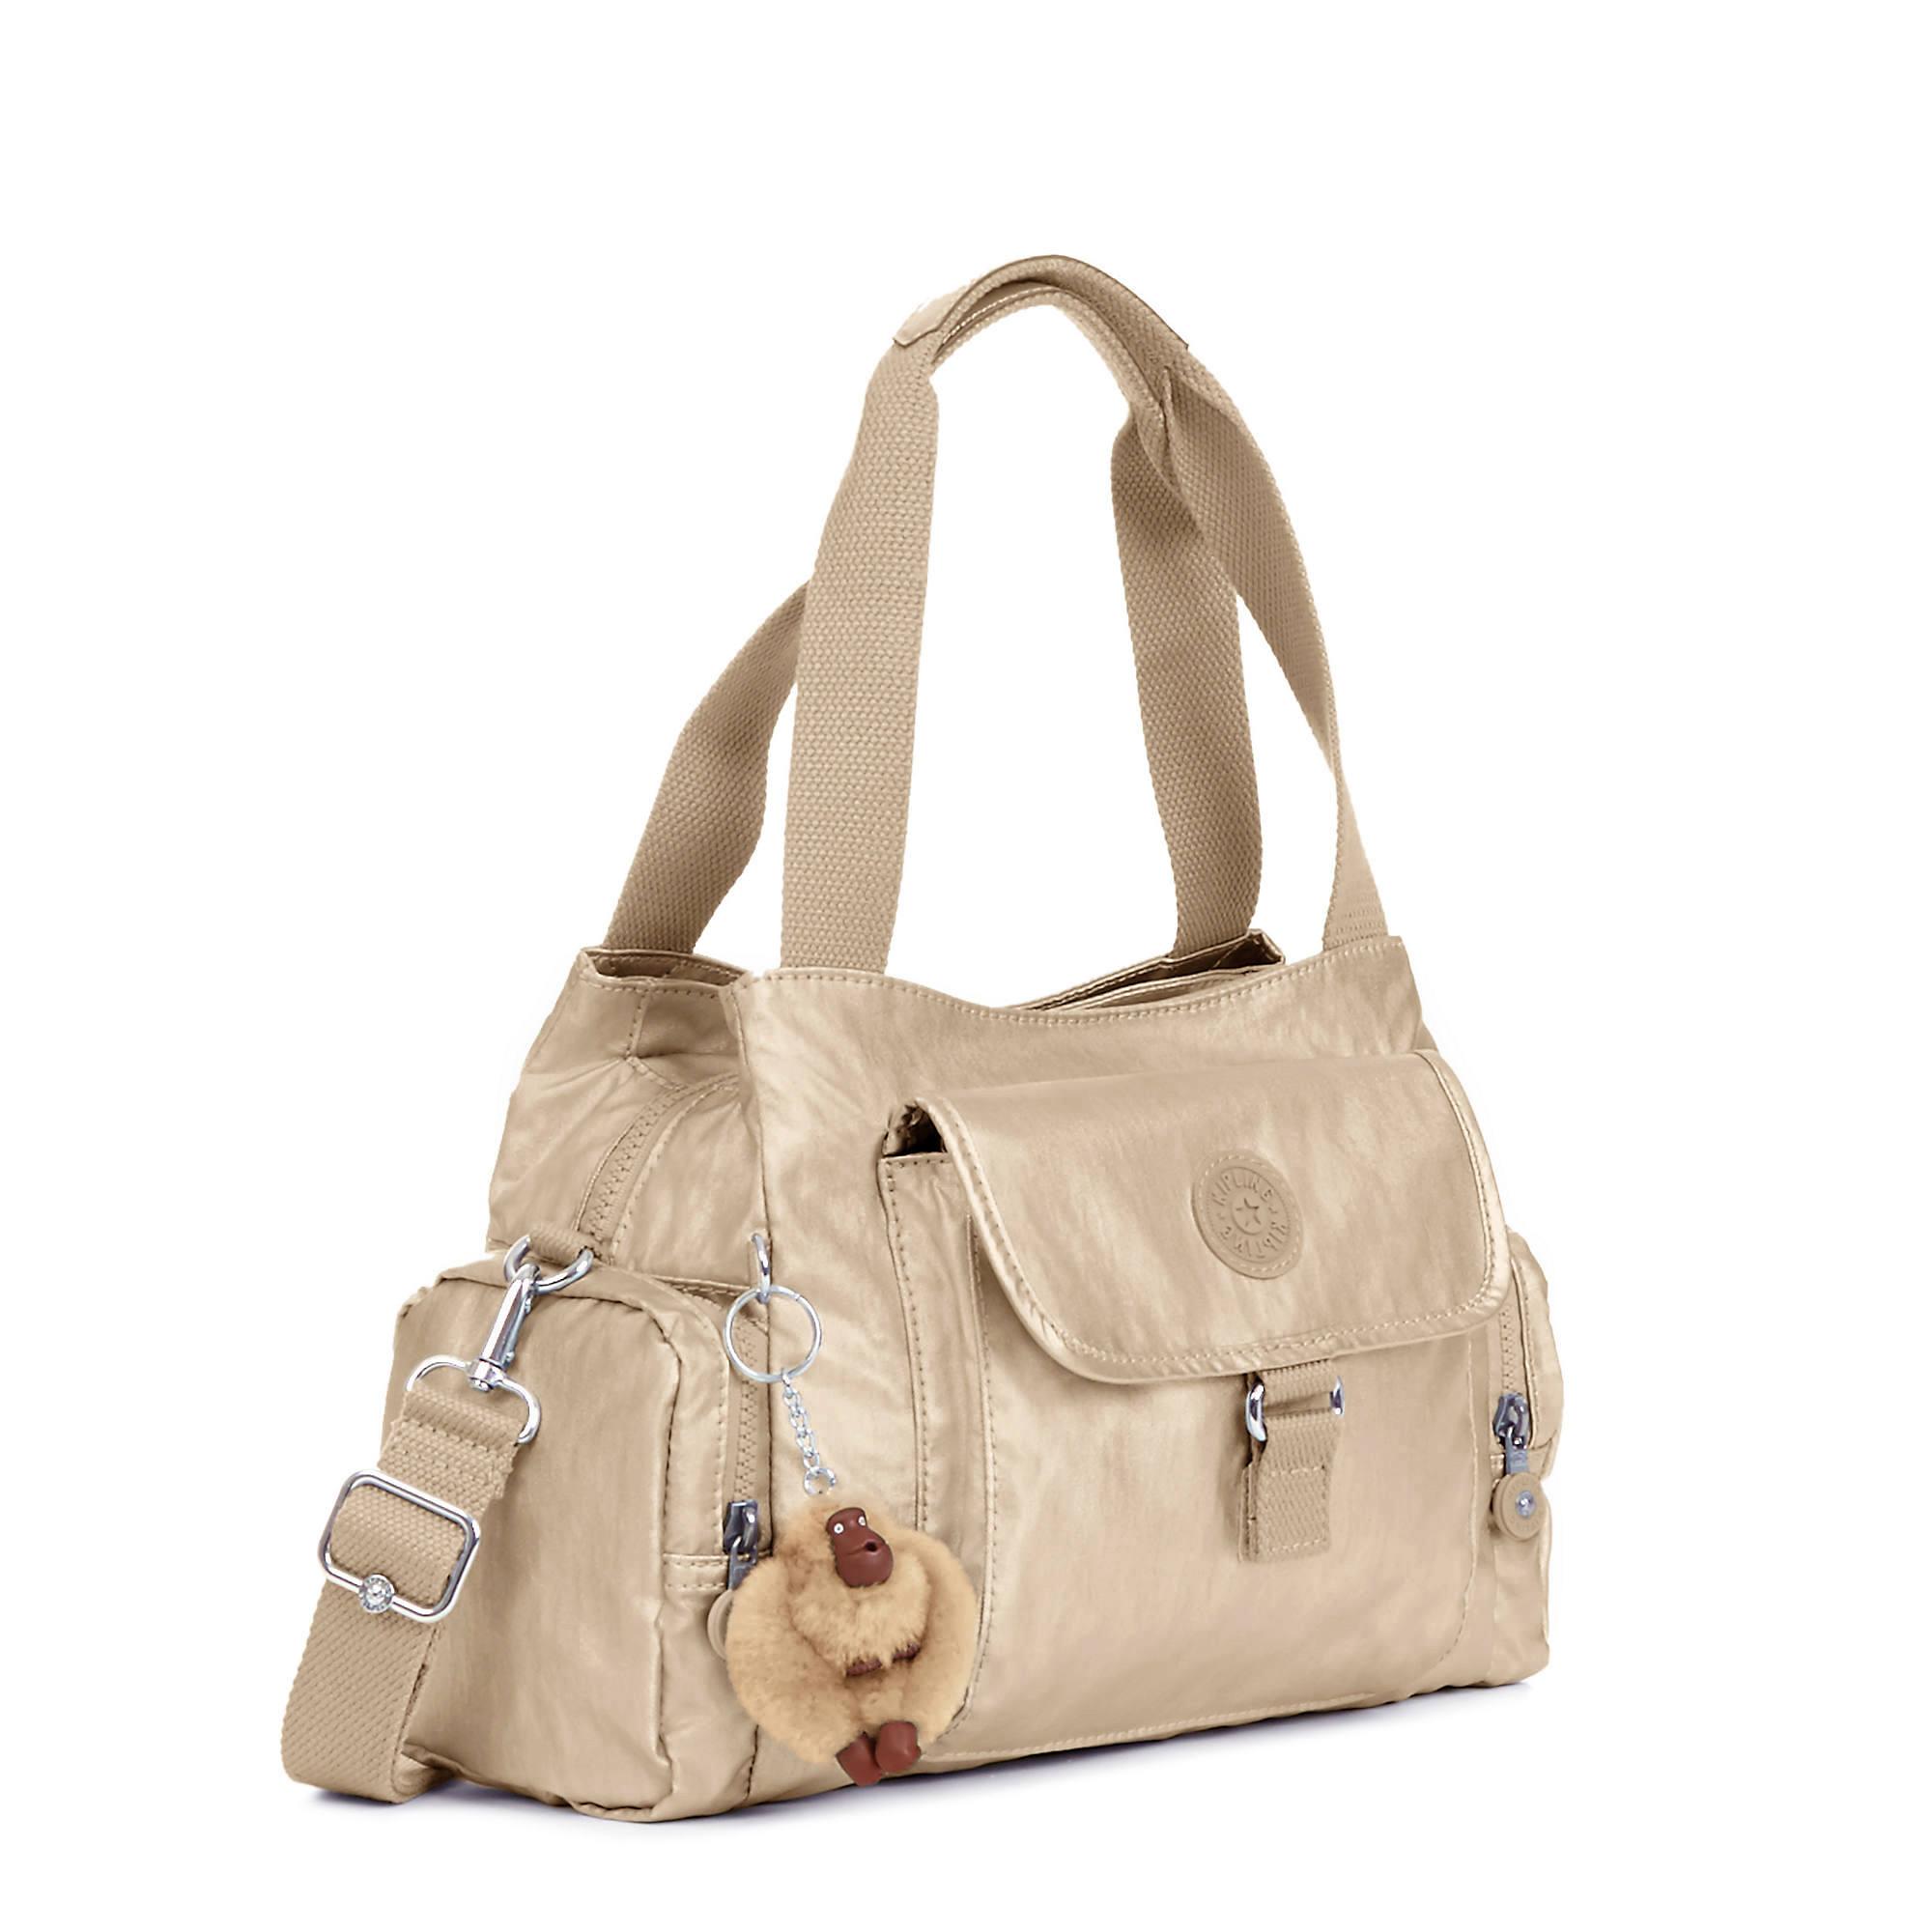 Kipling-Felix-Large-Handbag miniature 32